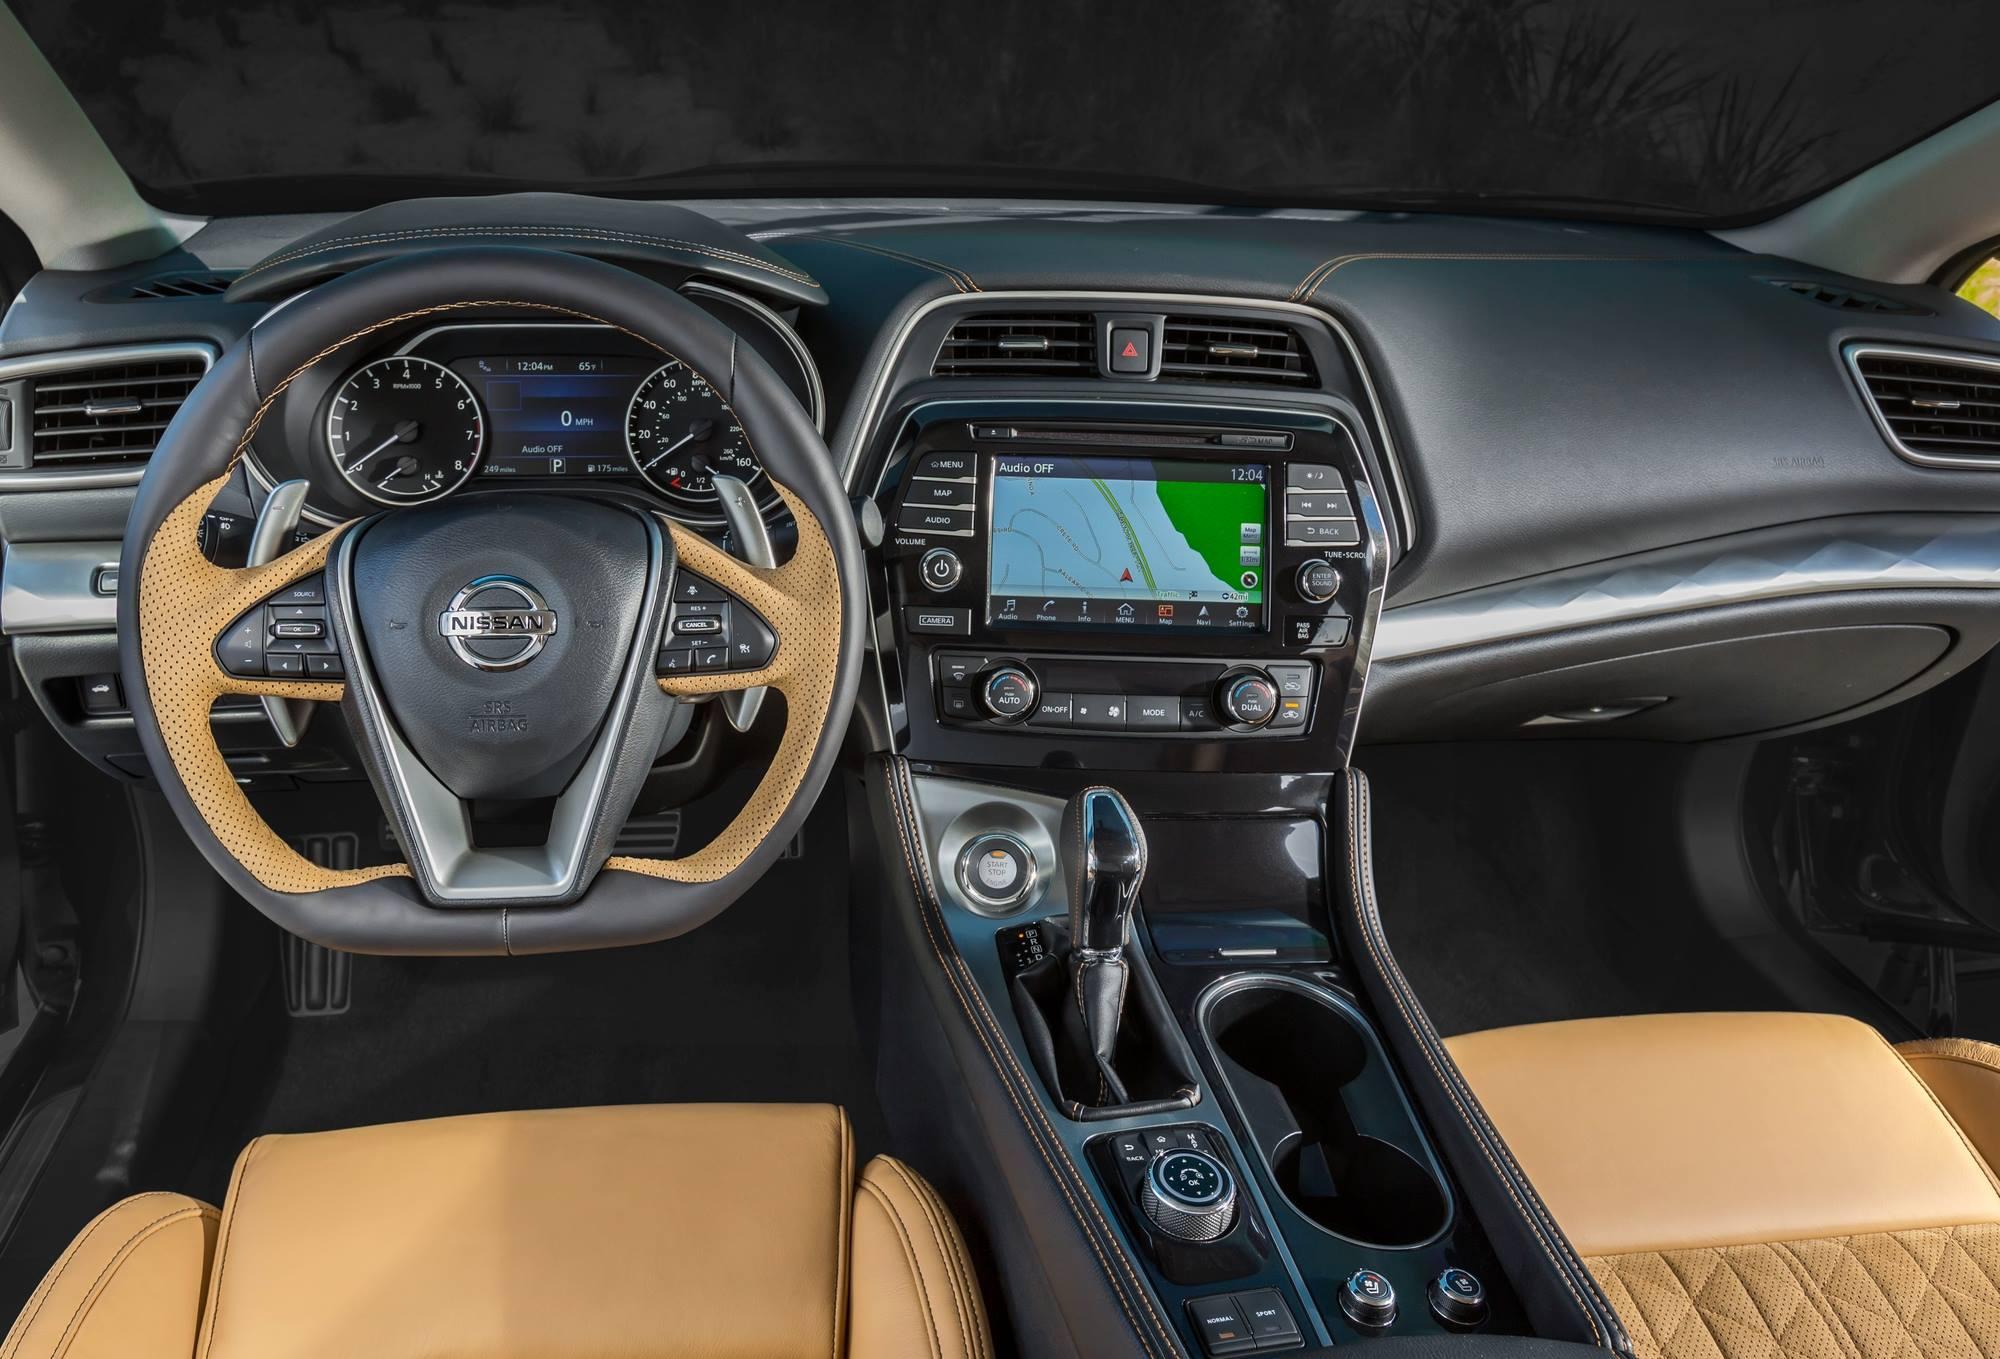 2016 Nissan Maxima Interior Best Accessories Home 2017